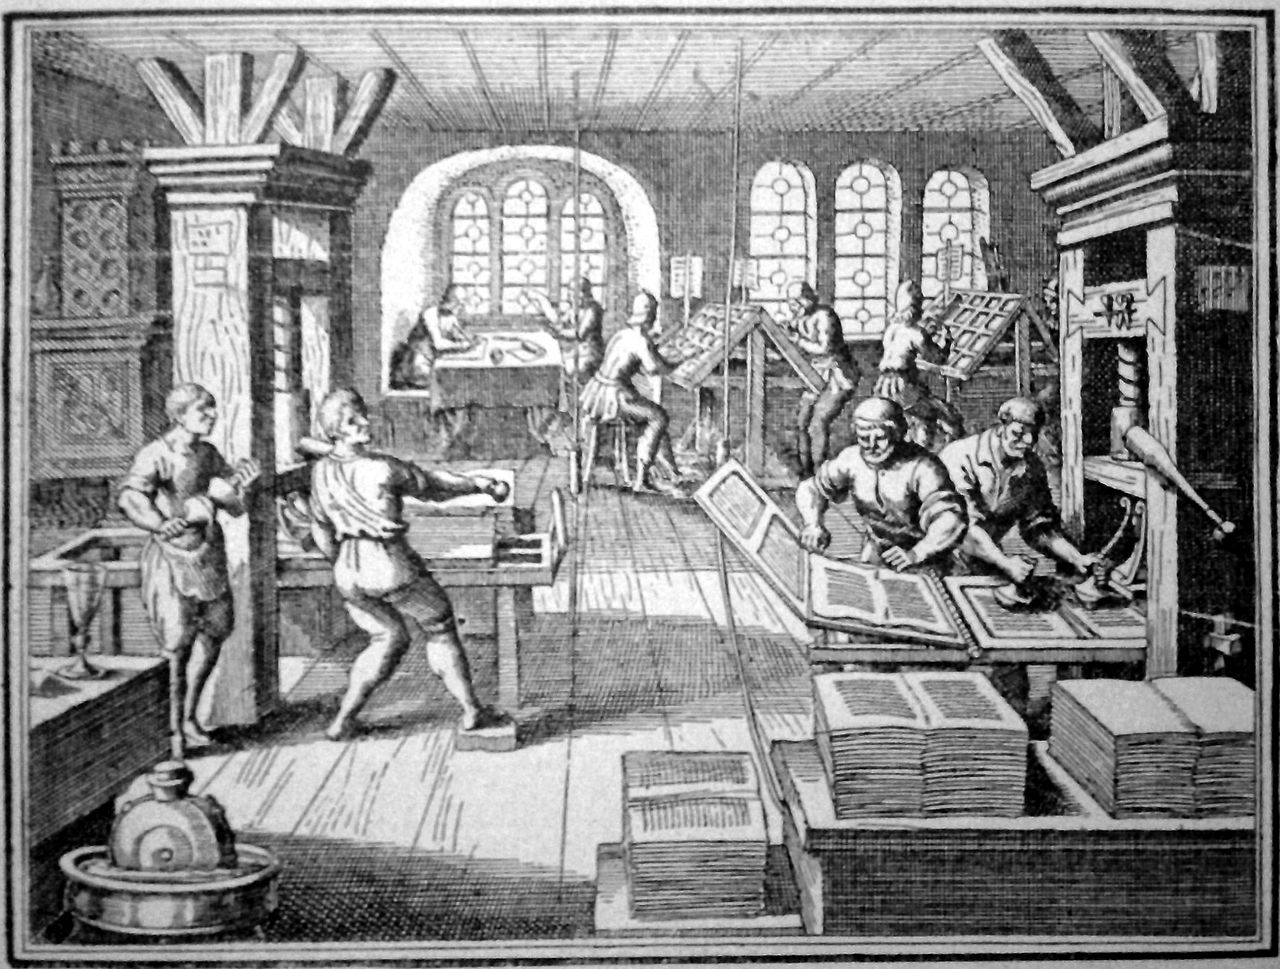 """Printing press, 16th century in Germany"" from Tolnai világtörténelme. Ujkor -könyv (1908)"